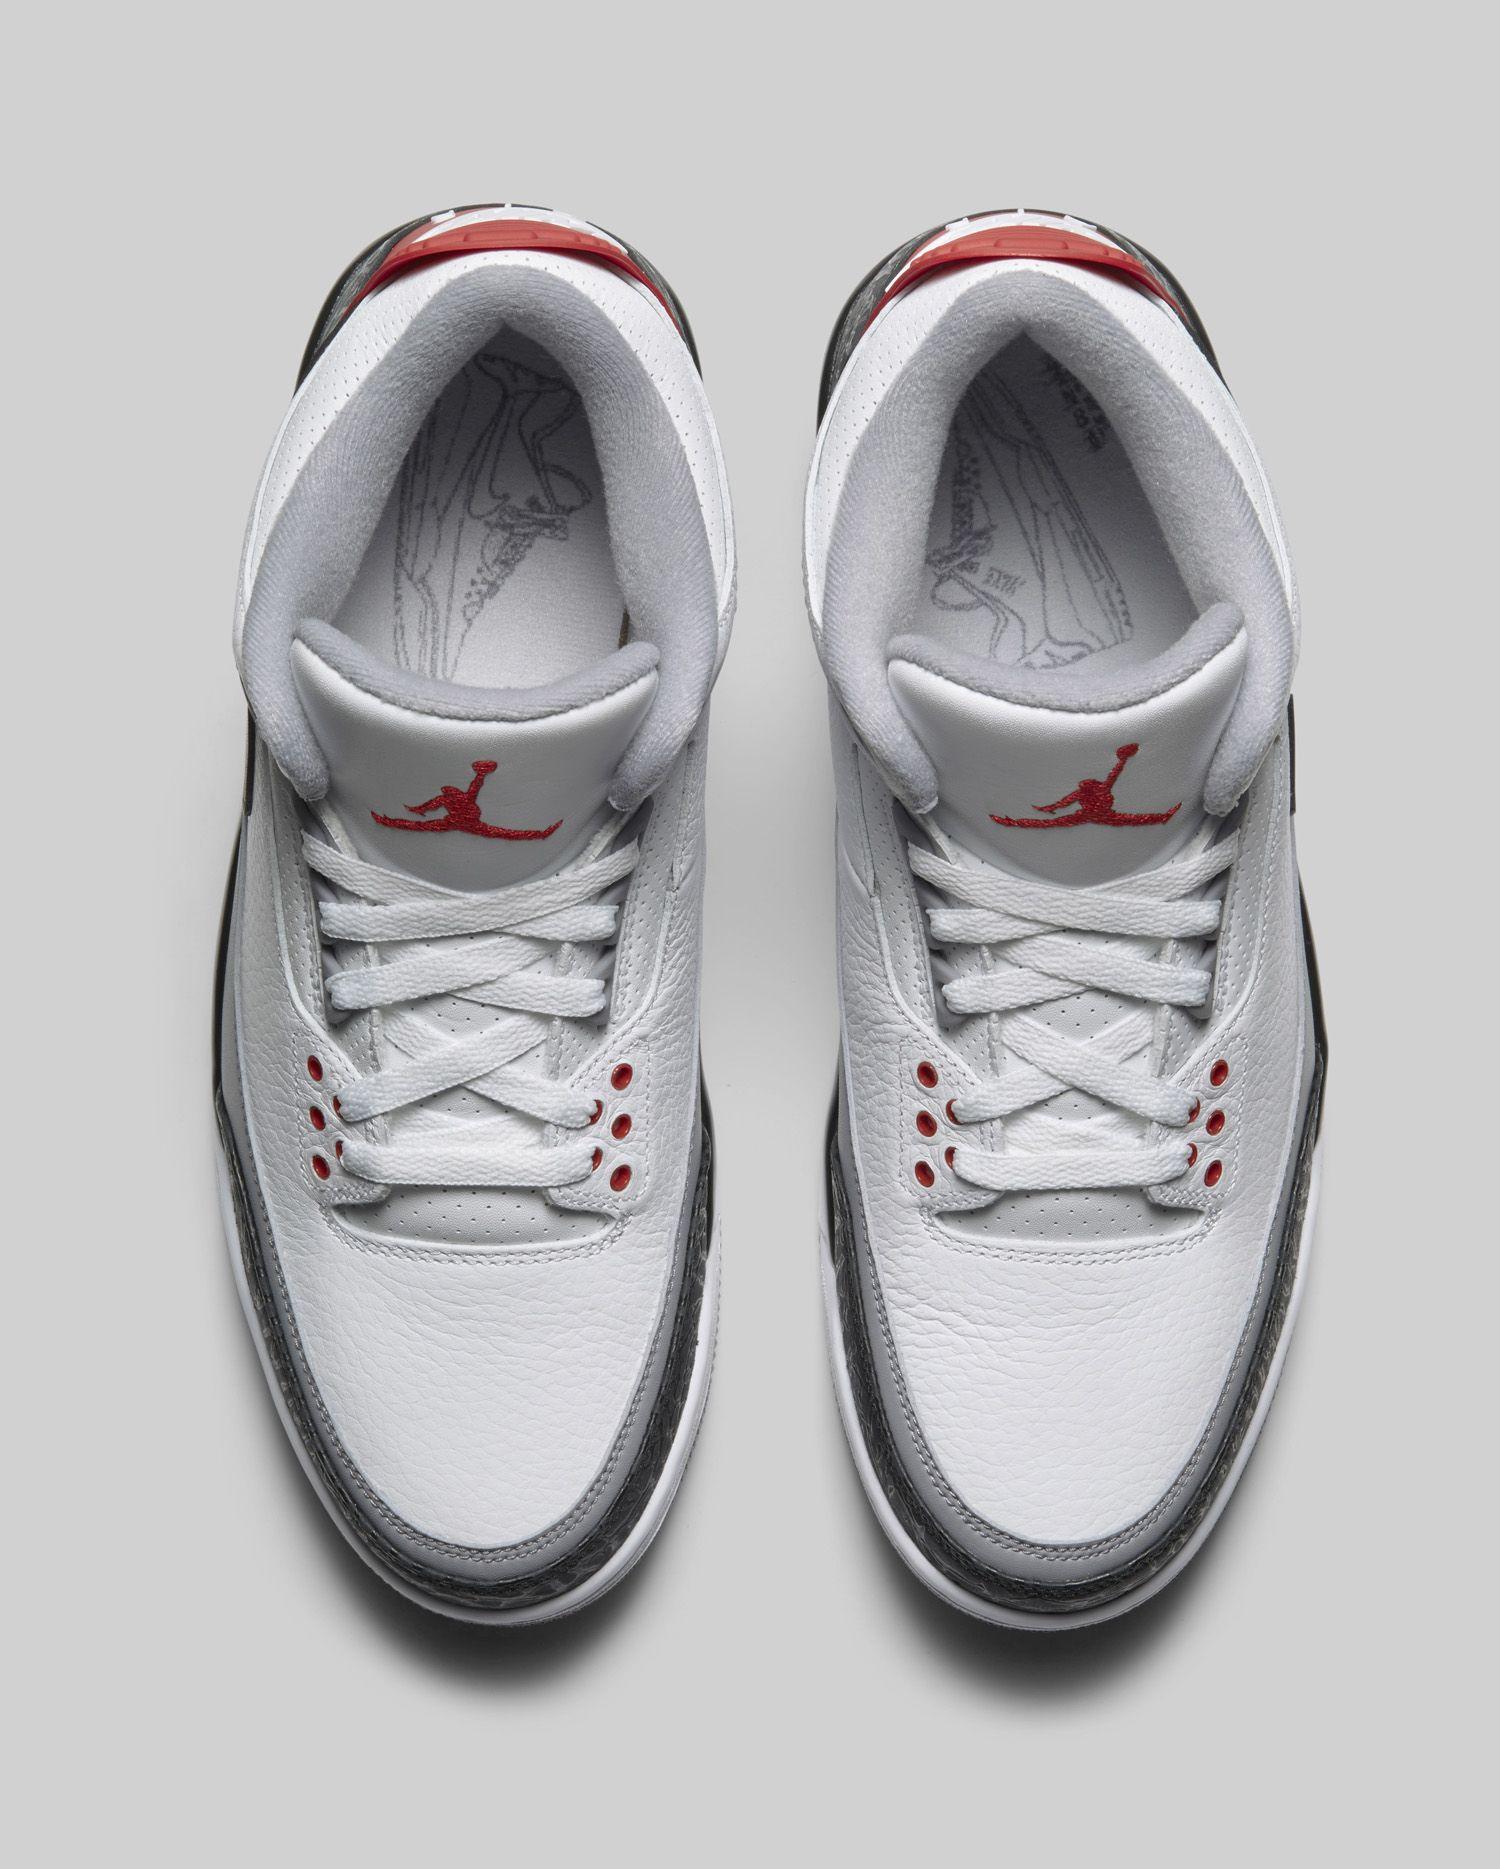 18d91dcb1dfc The Original Air Jordan 3 Sketch Comes to Life with the Air Jordan 3   Tinker  - WearTesters